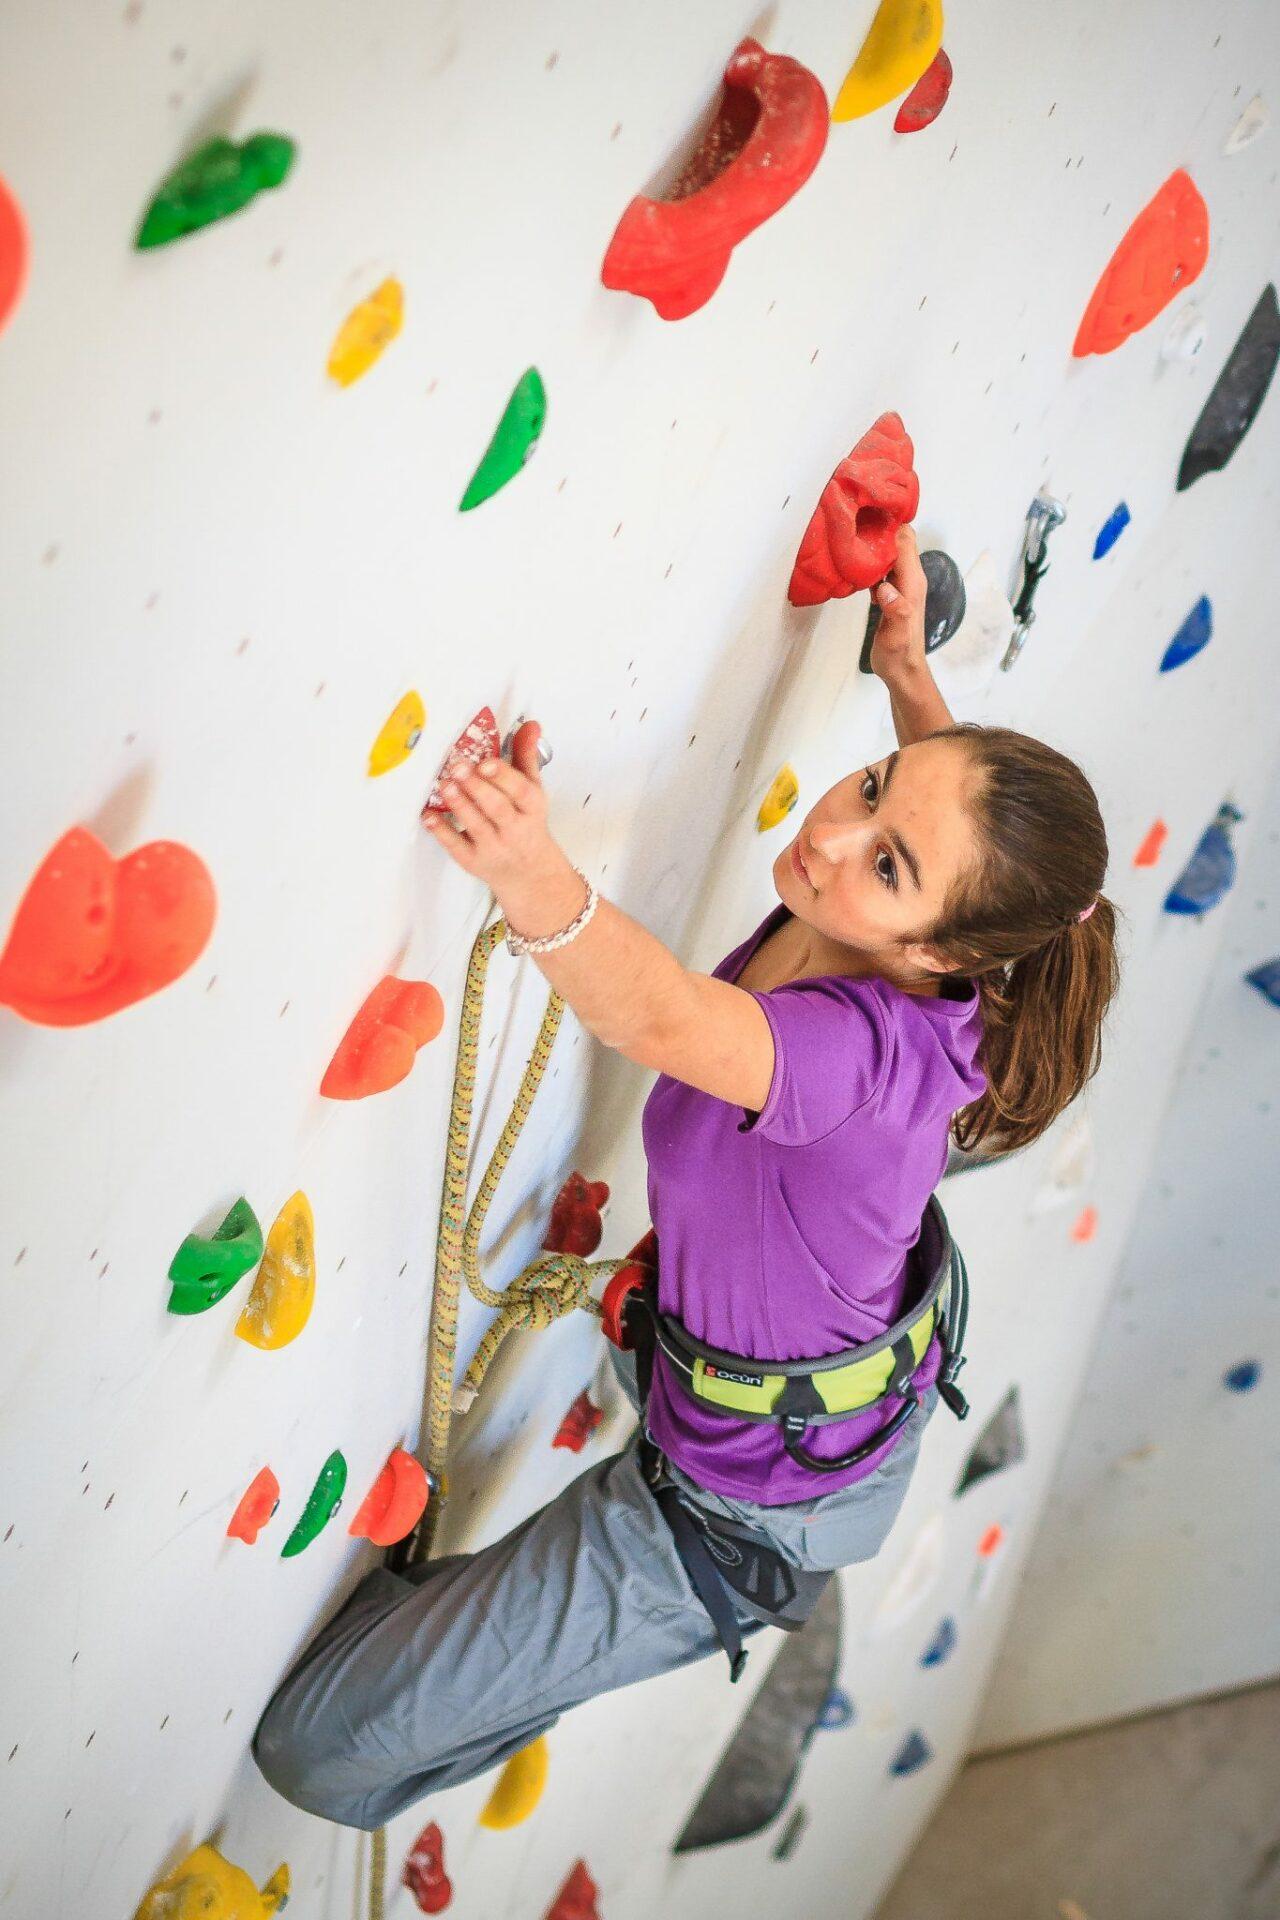 Kletternde Frau. Foto: Torsten Hans